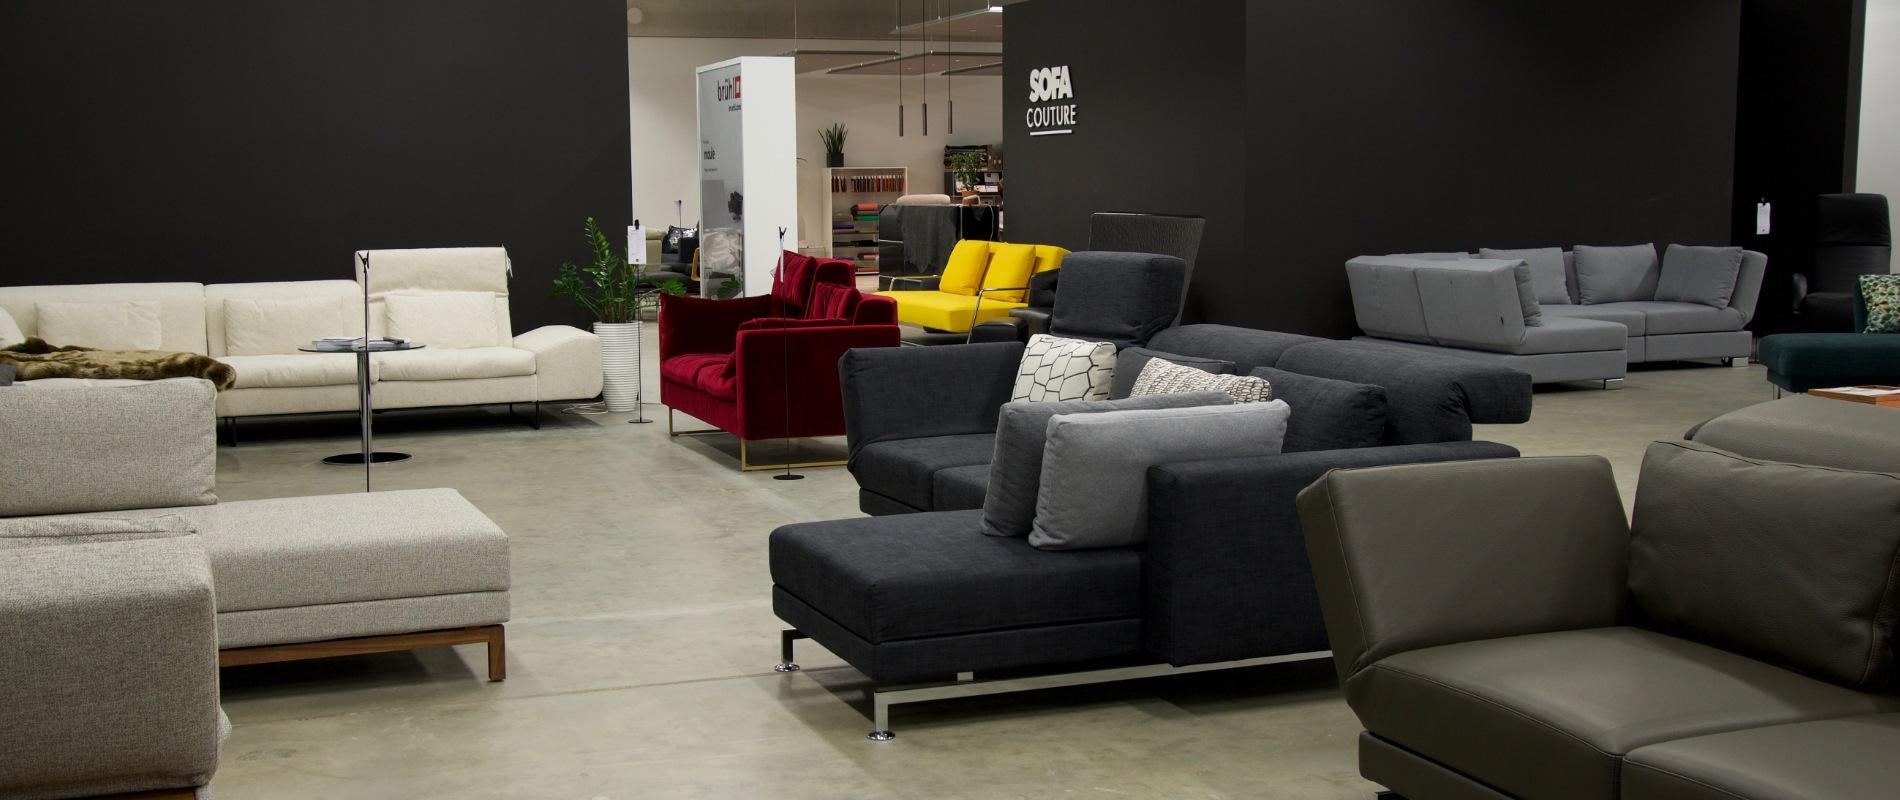 ber hmt polsterm bel frankfurt zeitgen ssisch die. Black Bedroom Furniture Sets. Home Design Ideas